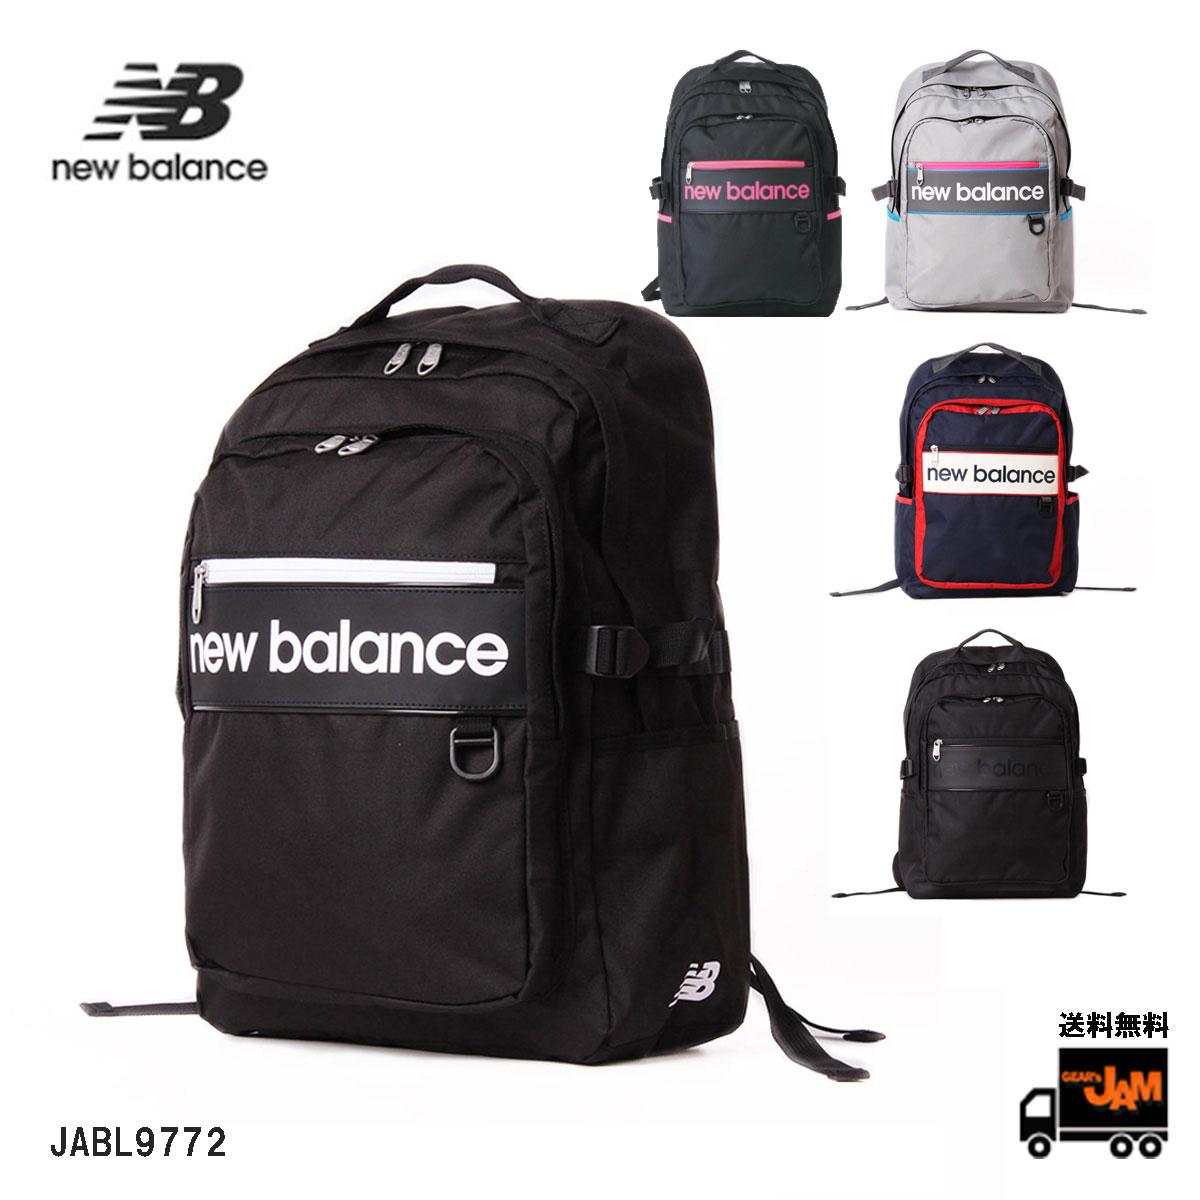 NEW 待望 BALANCEの997Hシリーズ NewBalance ニューバランス 997H DAY PACK JABL9772 SPORTS STYLE デイパック リュック 通勤 通学 大容量 メンズ 30L 2層 A3 年中無休 学生 ボーイズ 送料無料 軽量